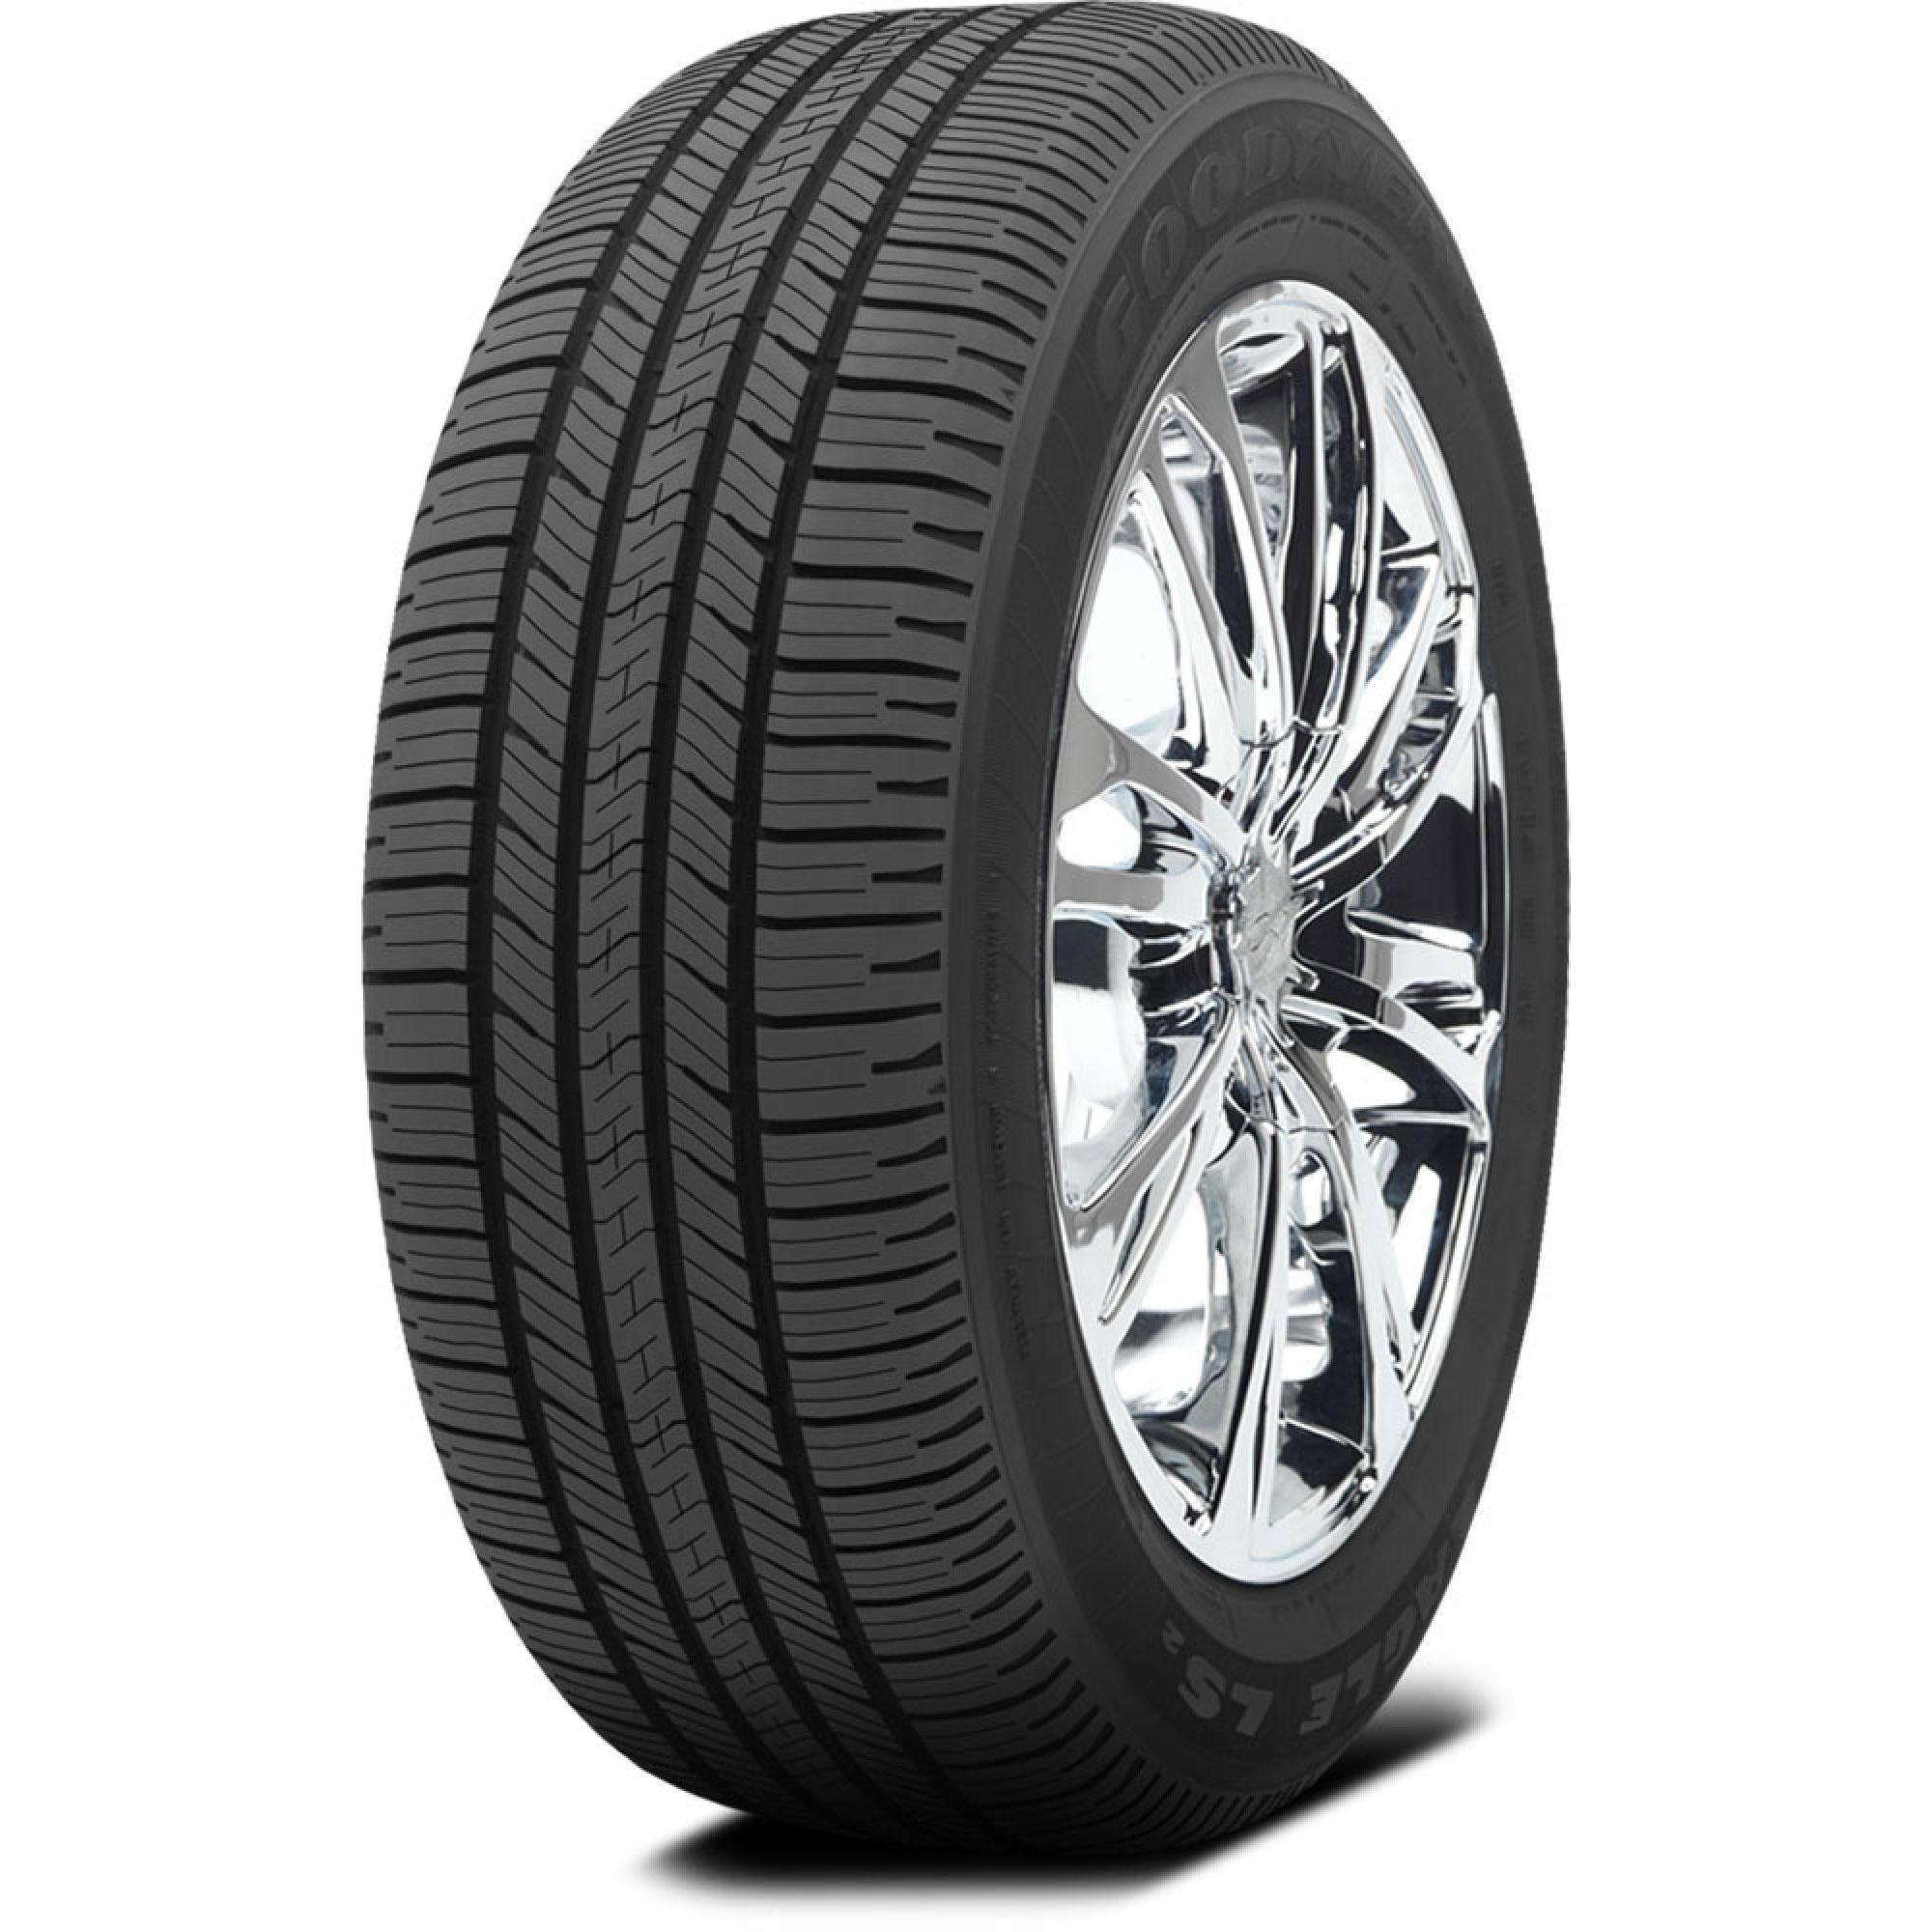 Branded Goodyear Tires Store Online In California Branded